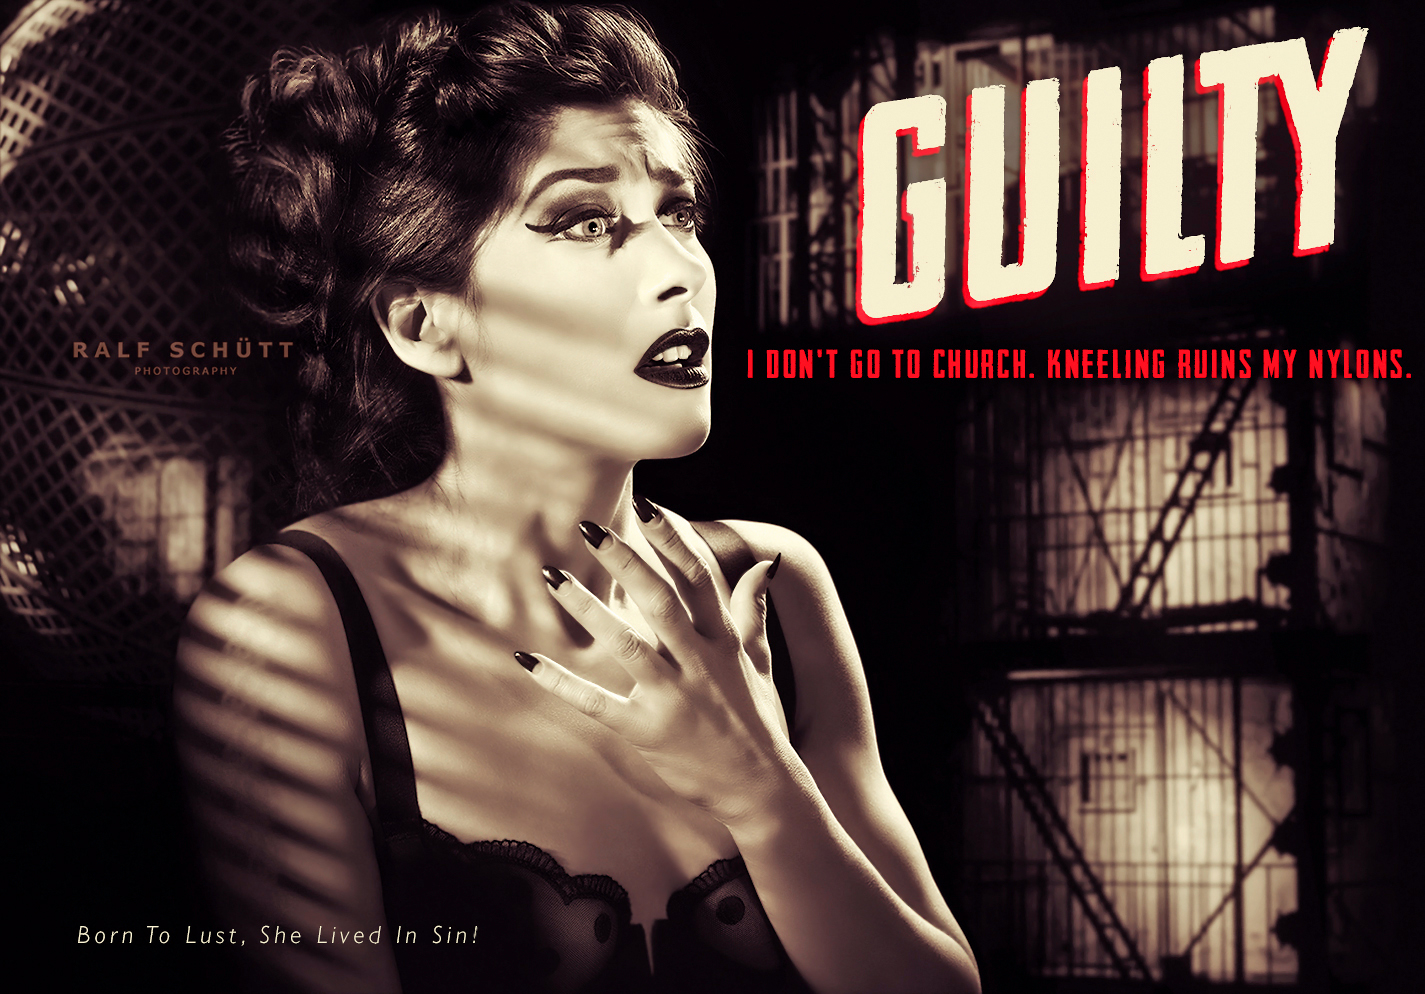 Louise de Ville - Pulp Fiction Cover © Ralf Schütt Photography